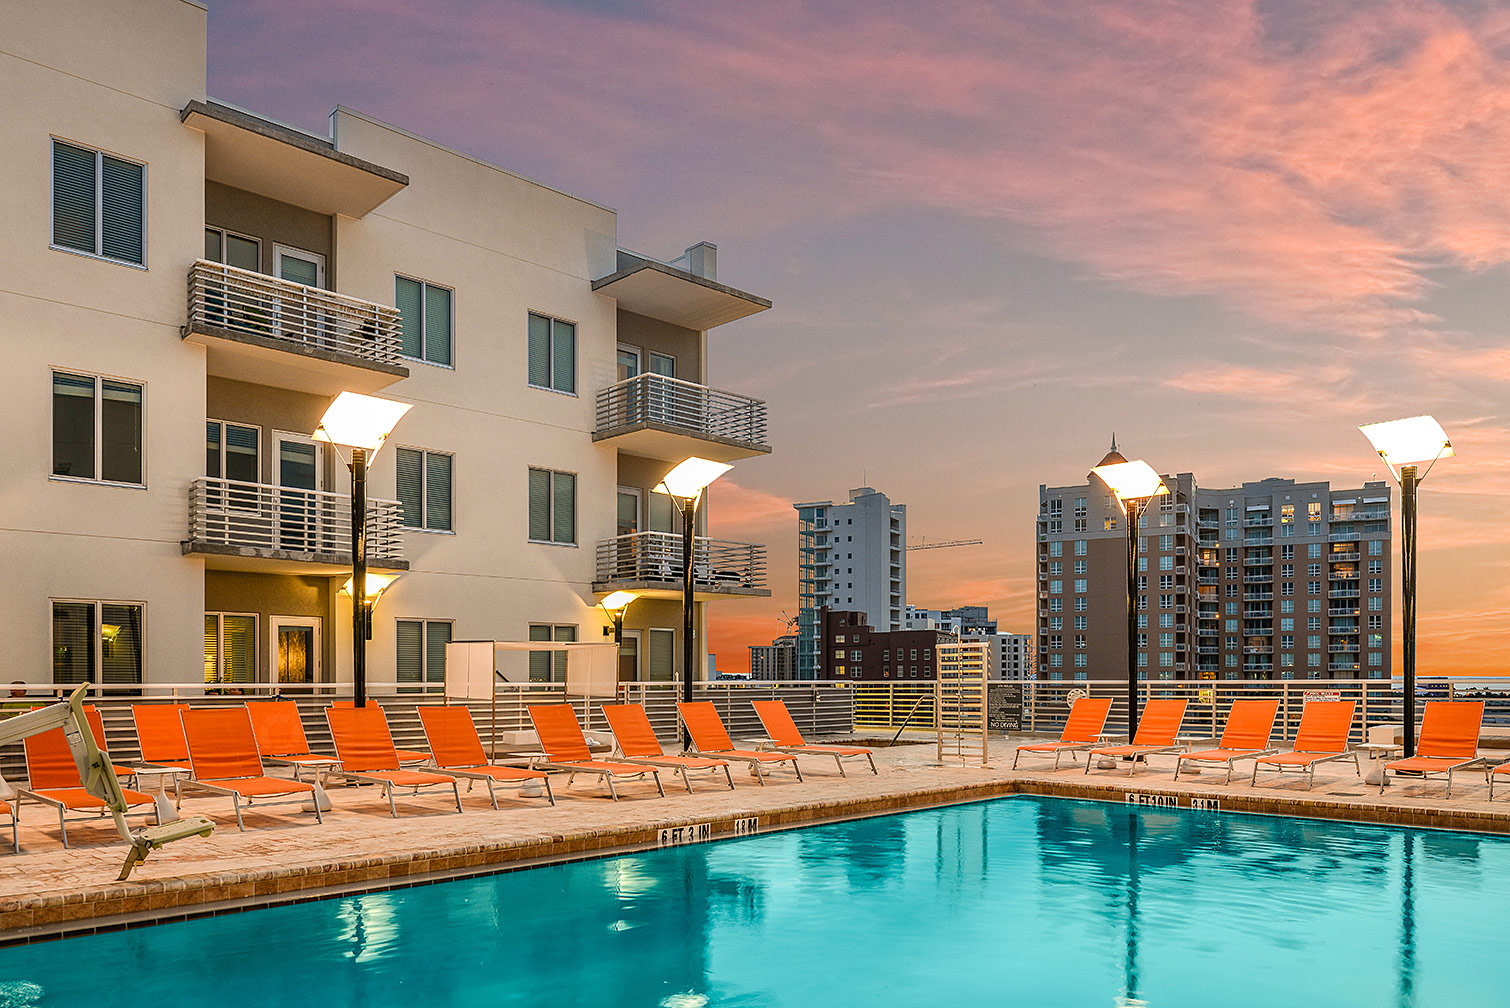 Aloft Hotel Pool at Night